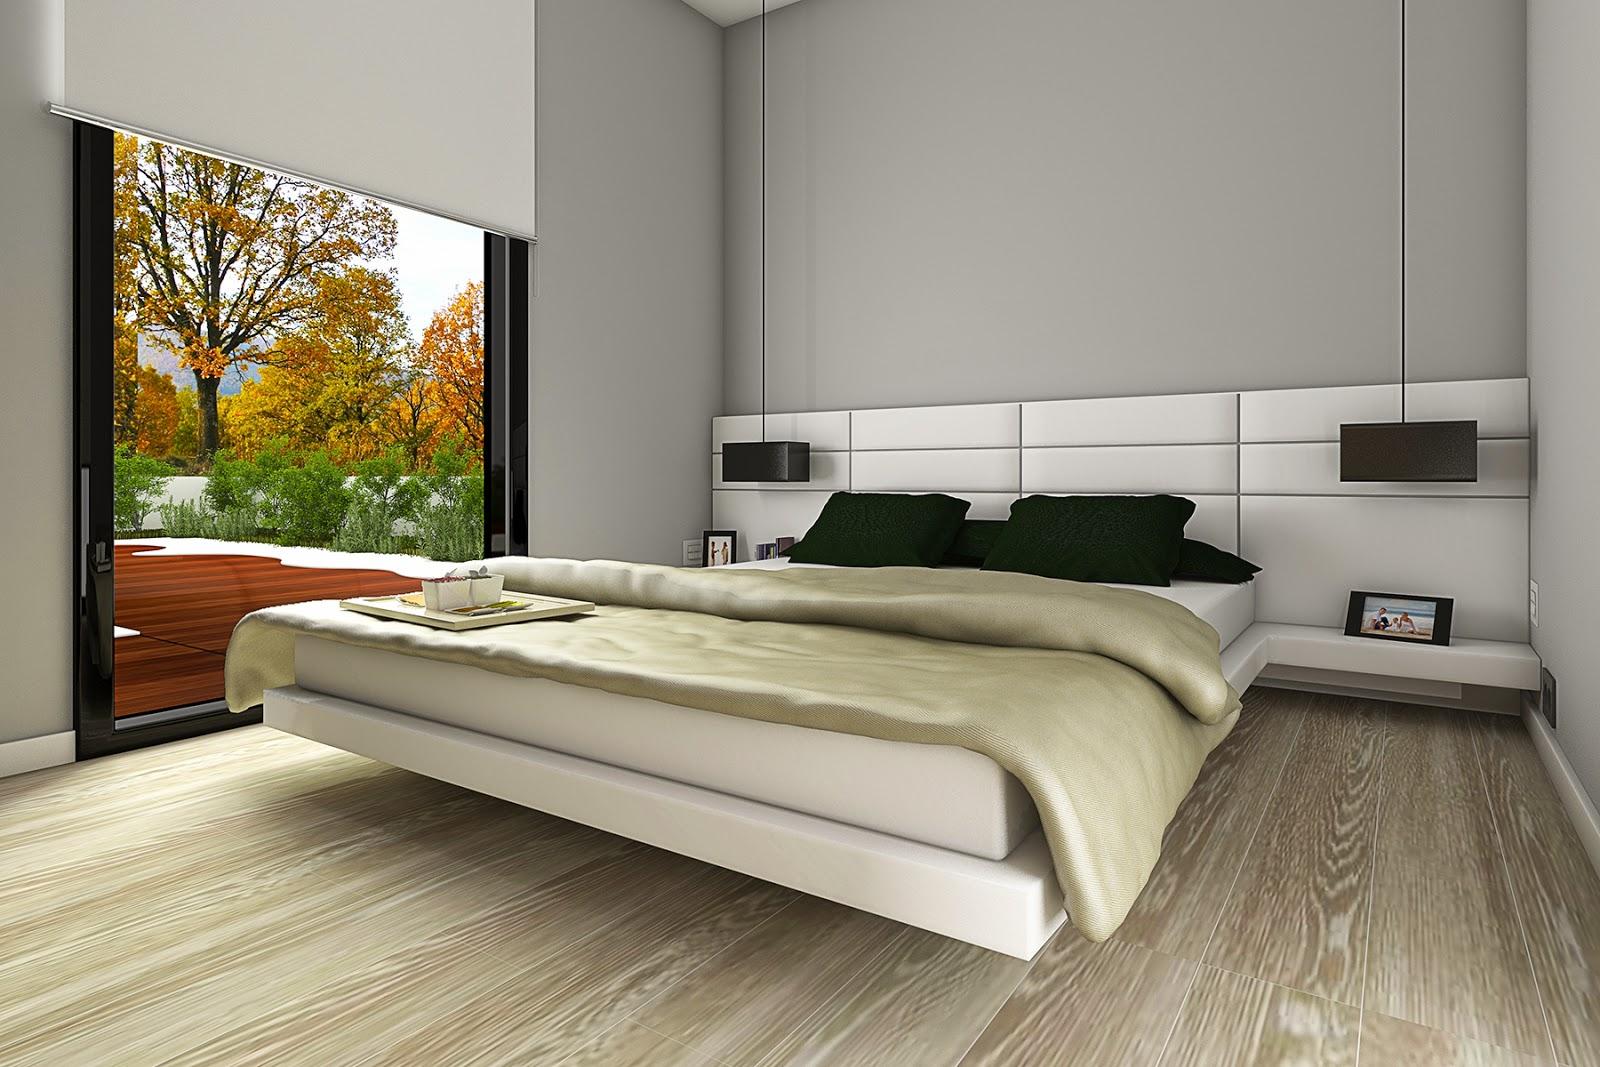 dormitorio-modulo-jardin-resan modular